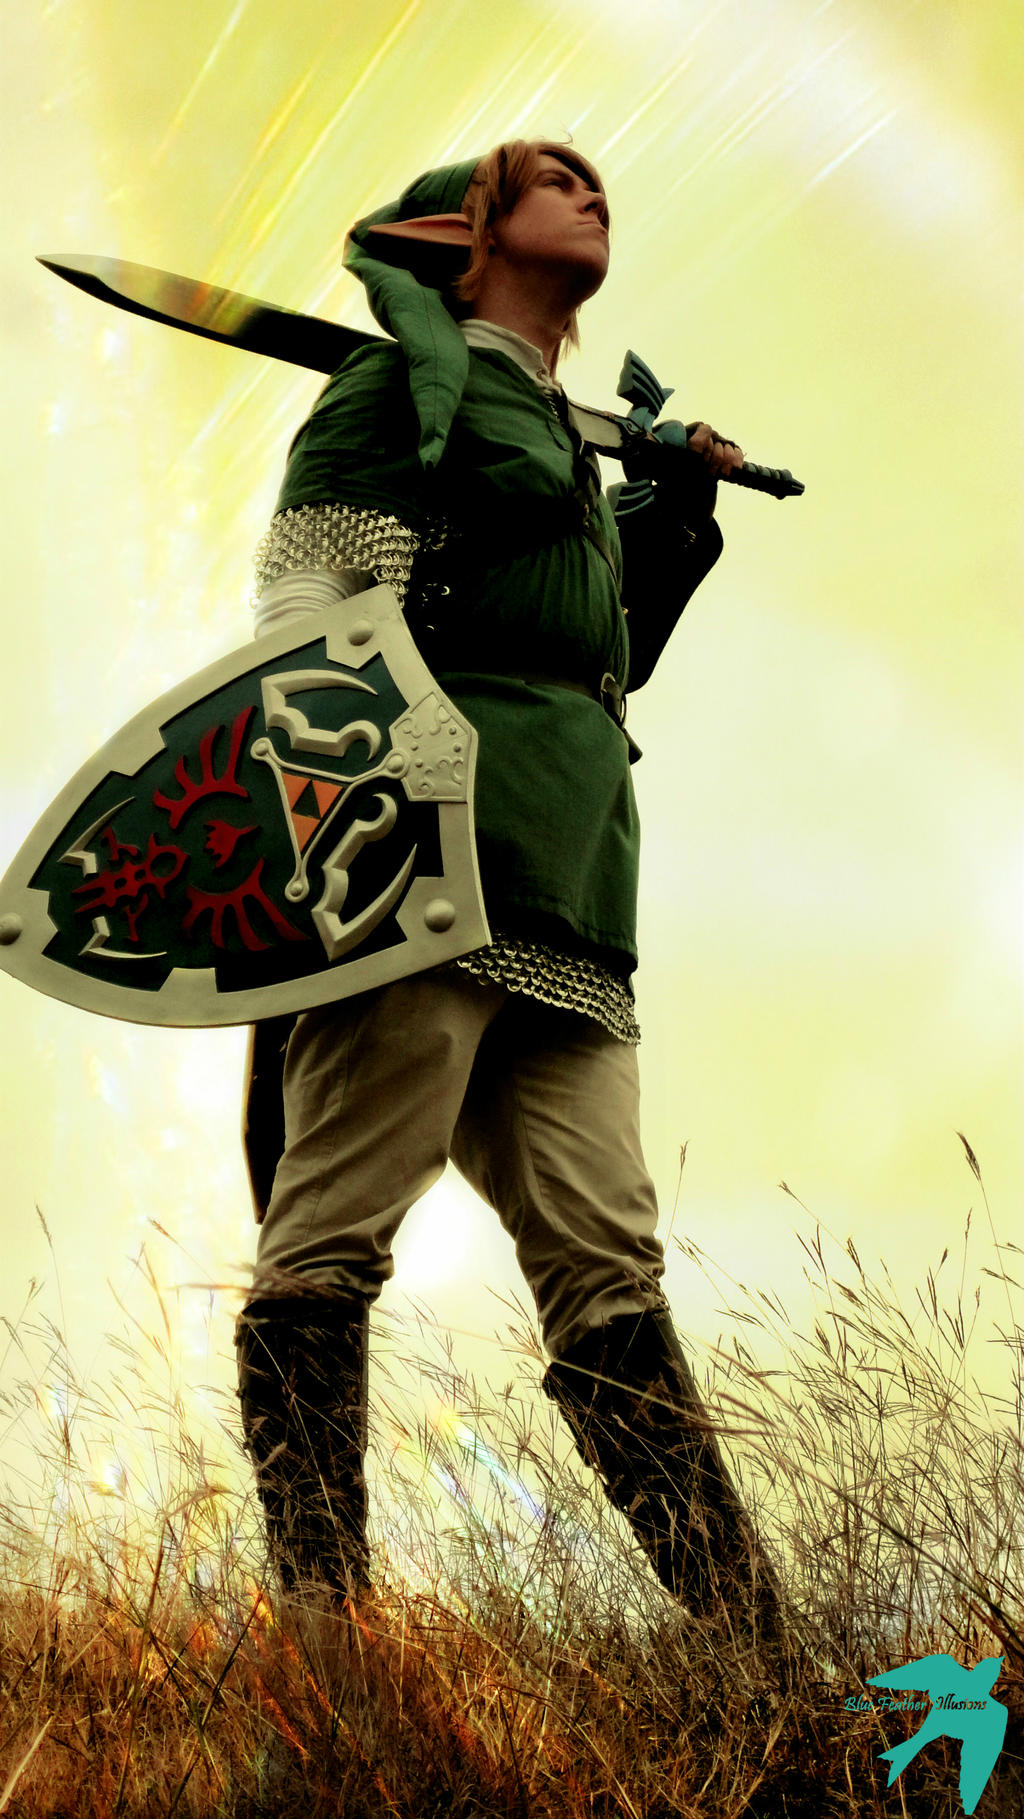 A Hylian Knight by dtsikorski